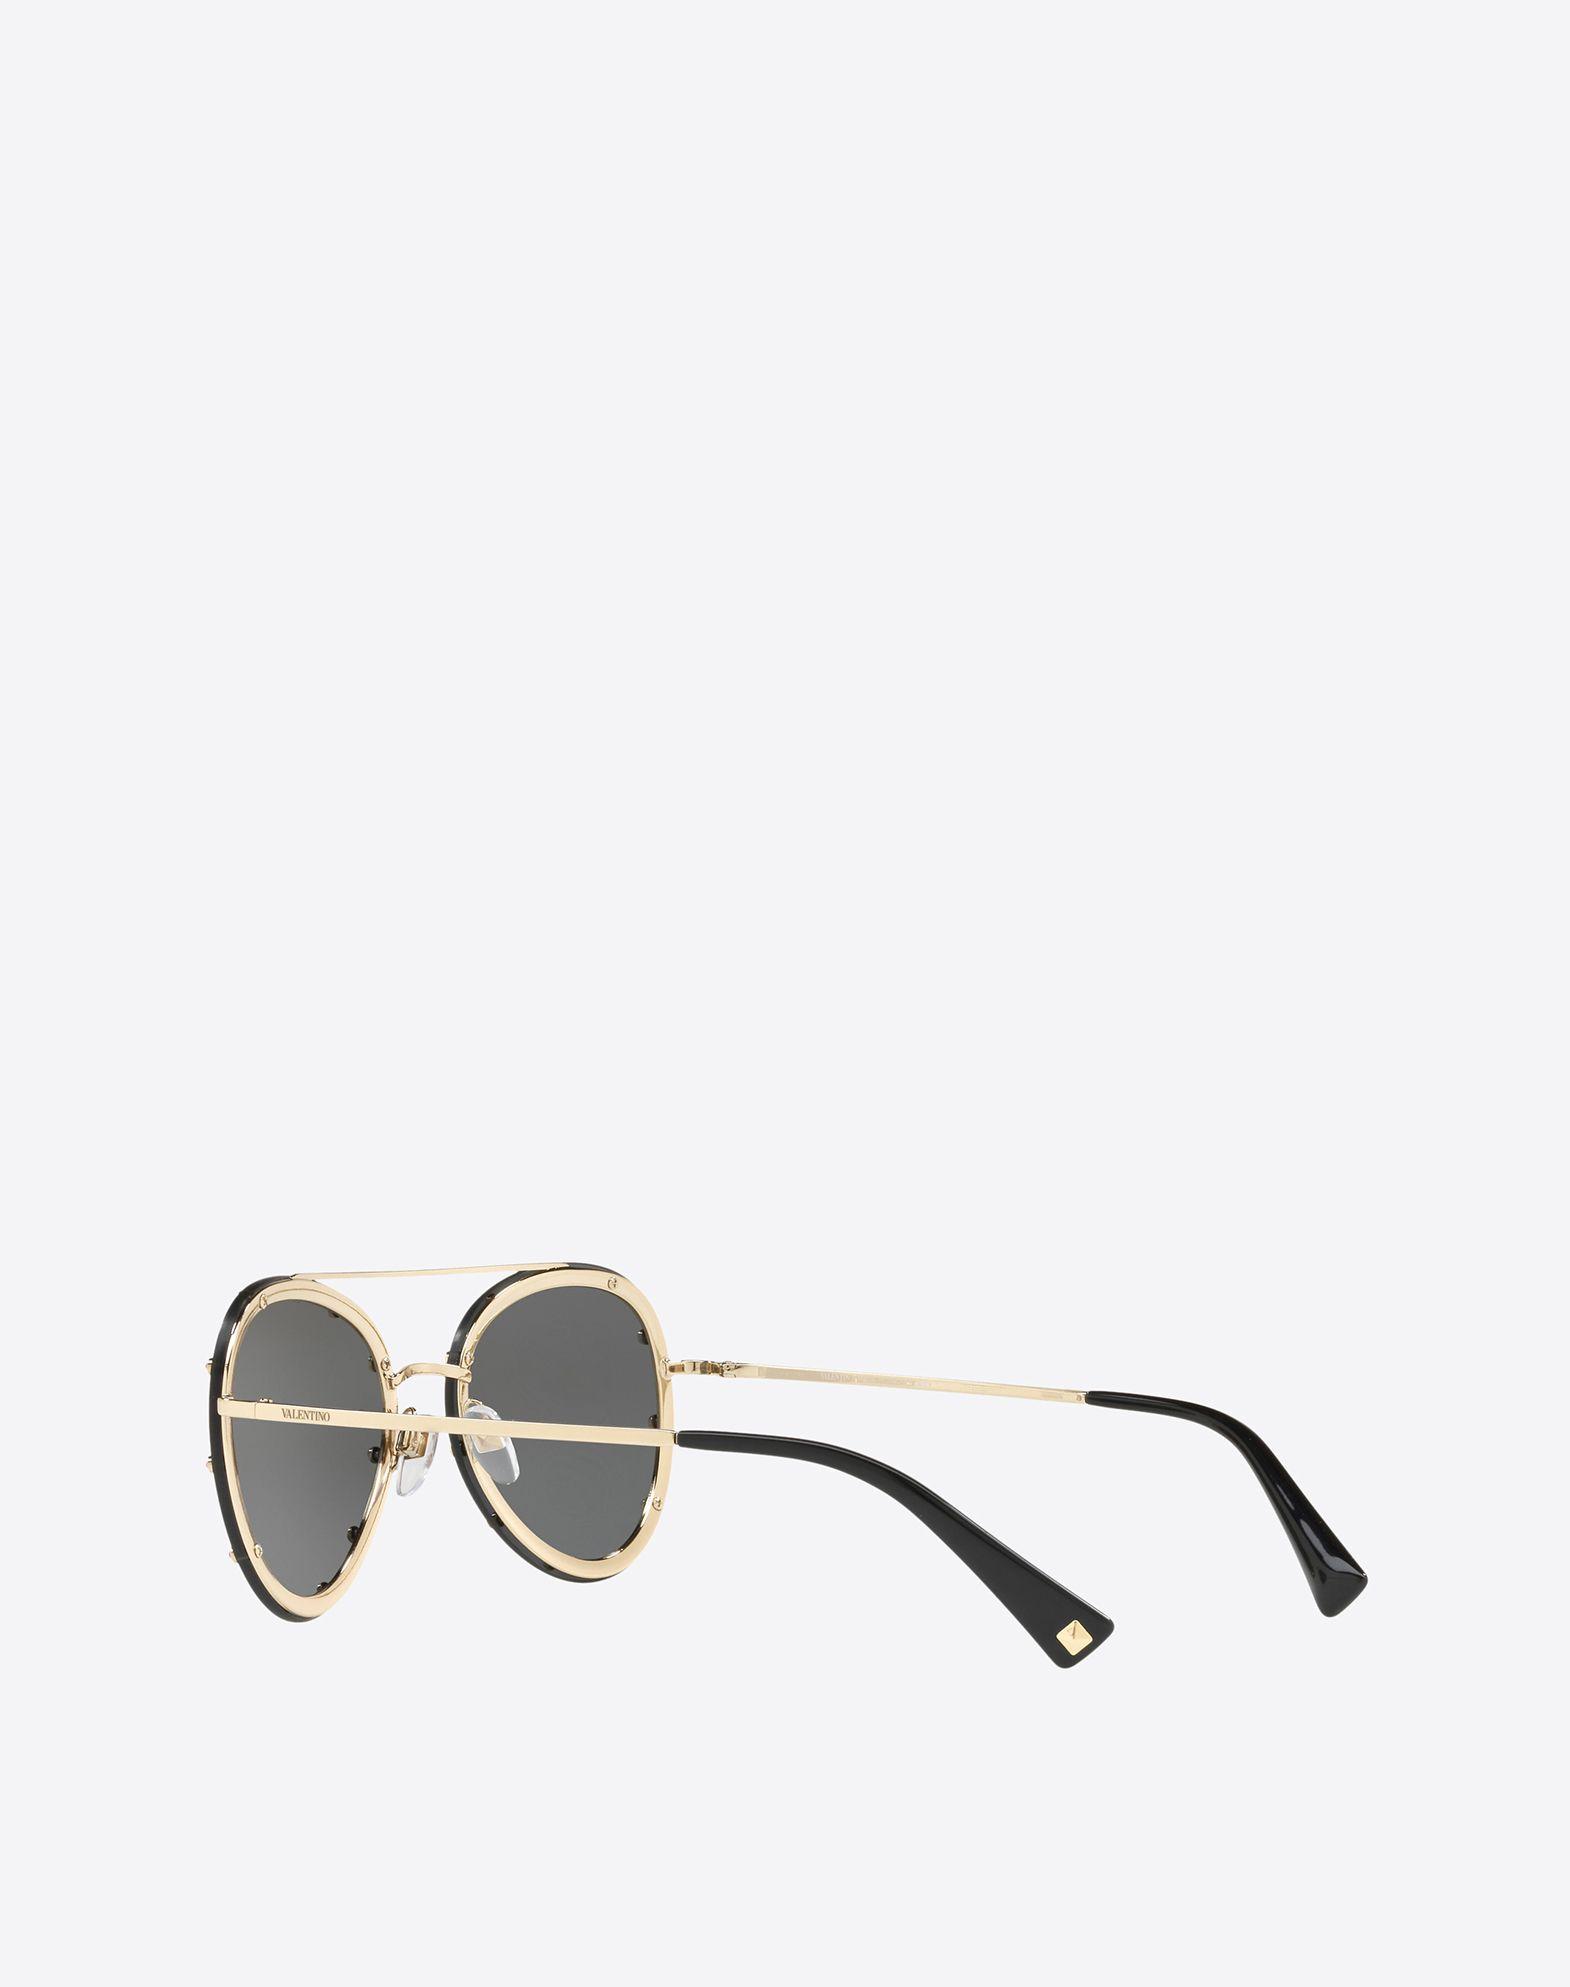 VALENTINO Metal and Acetate Sunglasses Sunglasses E e